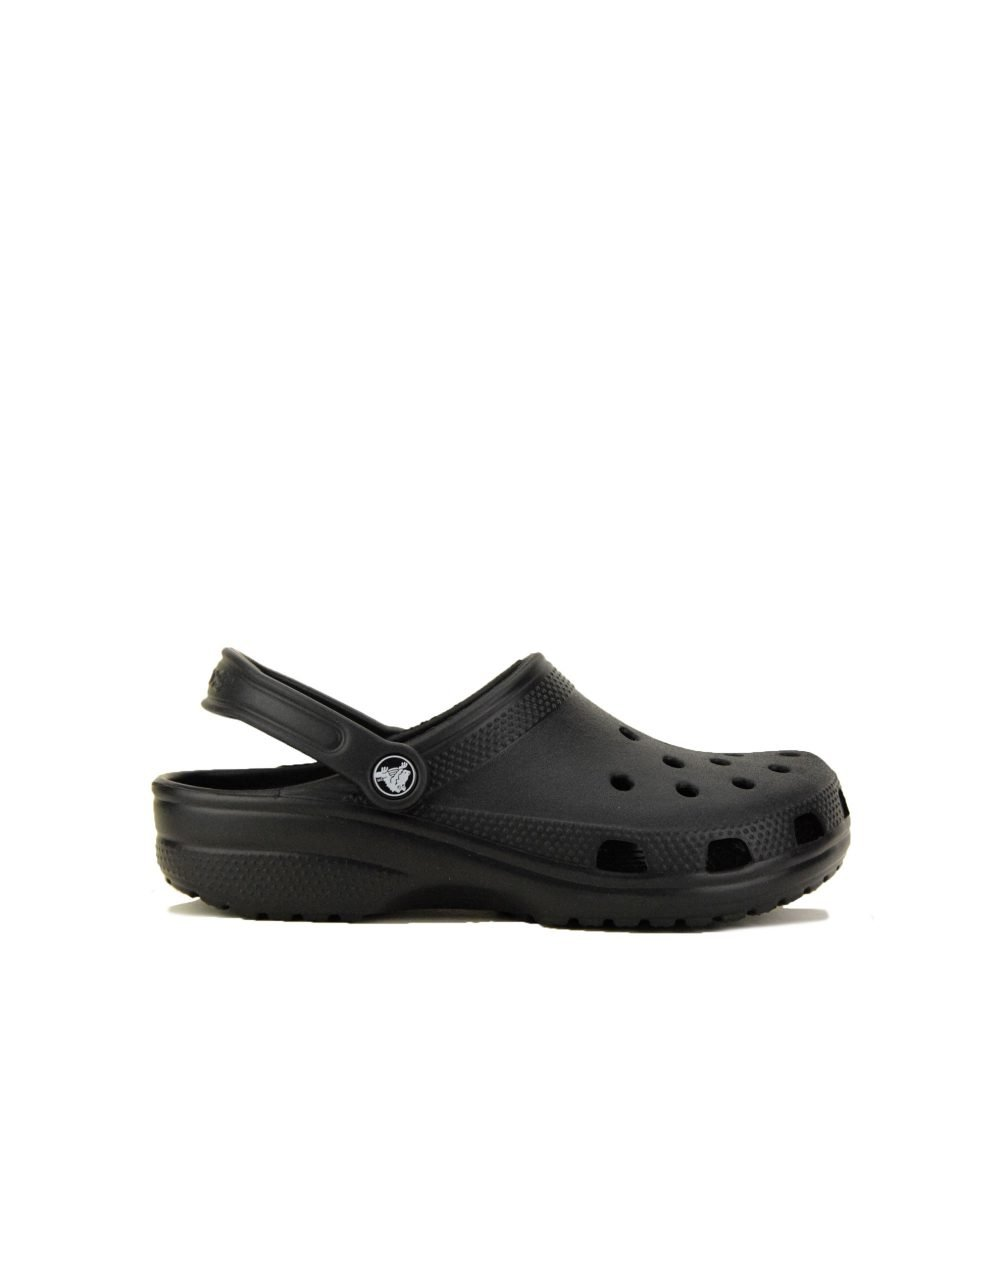 Crocs Classic (10001-001) Black